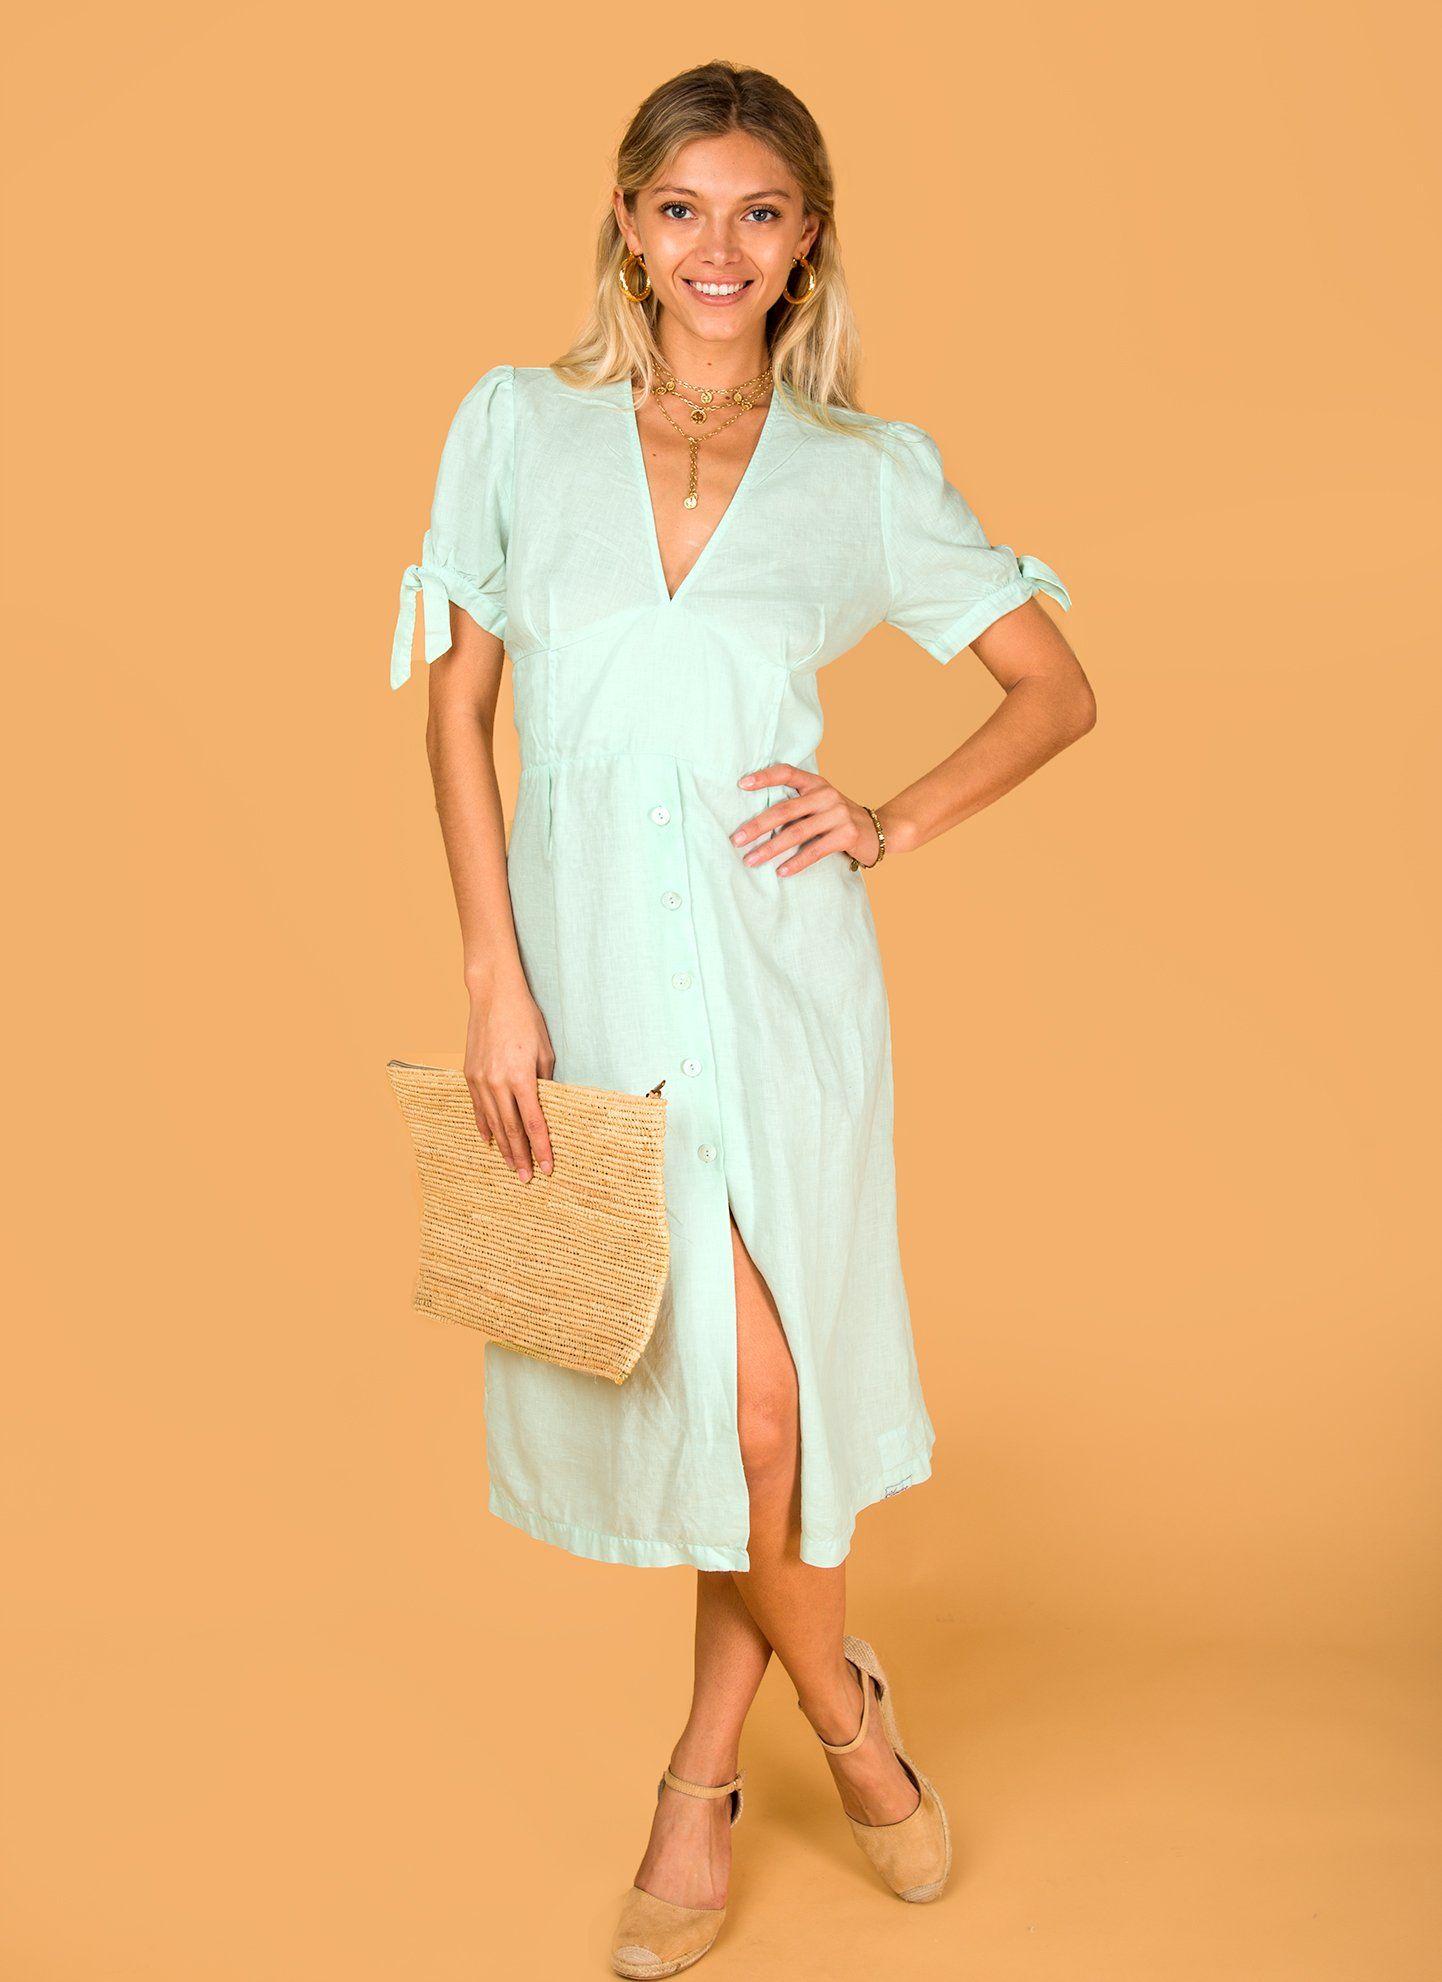 Photo of #8394 Dress Linen for Women – White, Aqua, Blue, Green All  100% Natural Italian Style Deep-V Dress With Button Details – XXL / AQUA